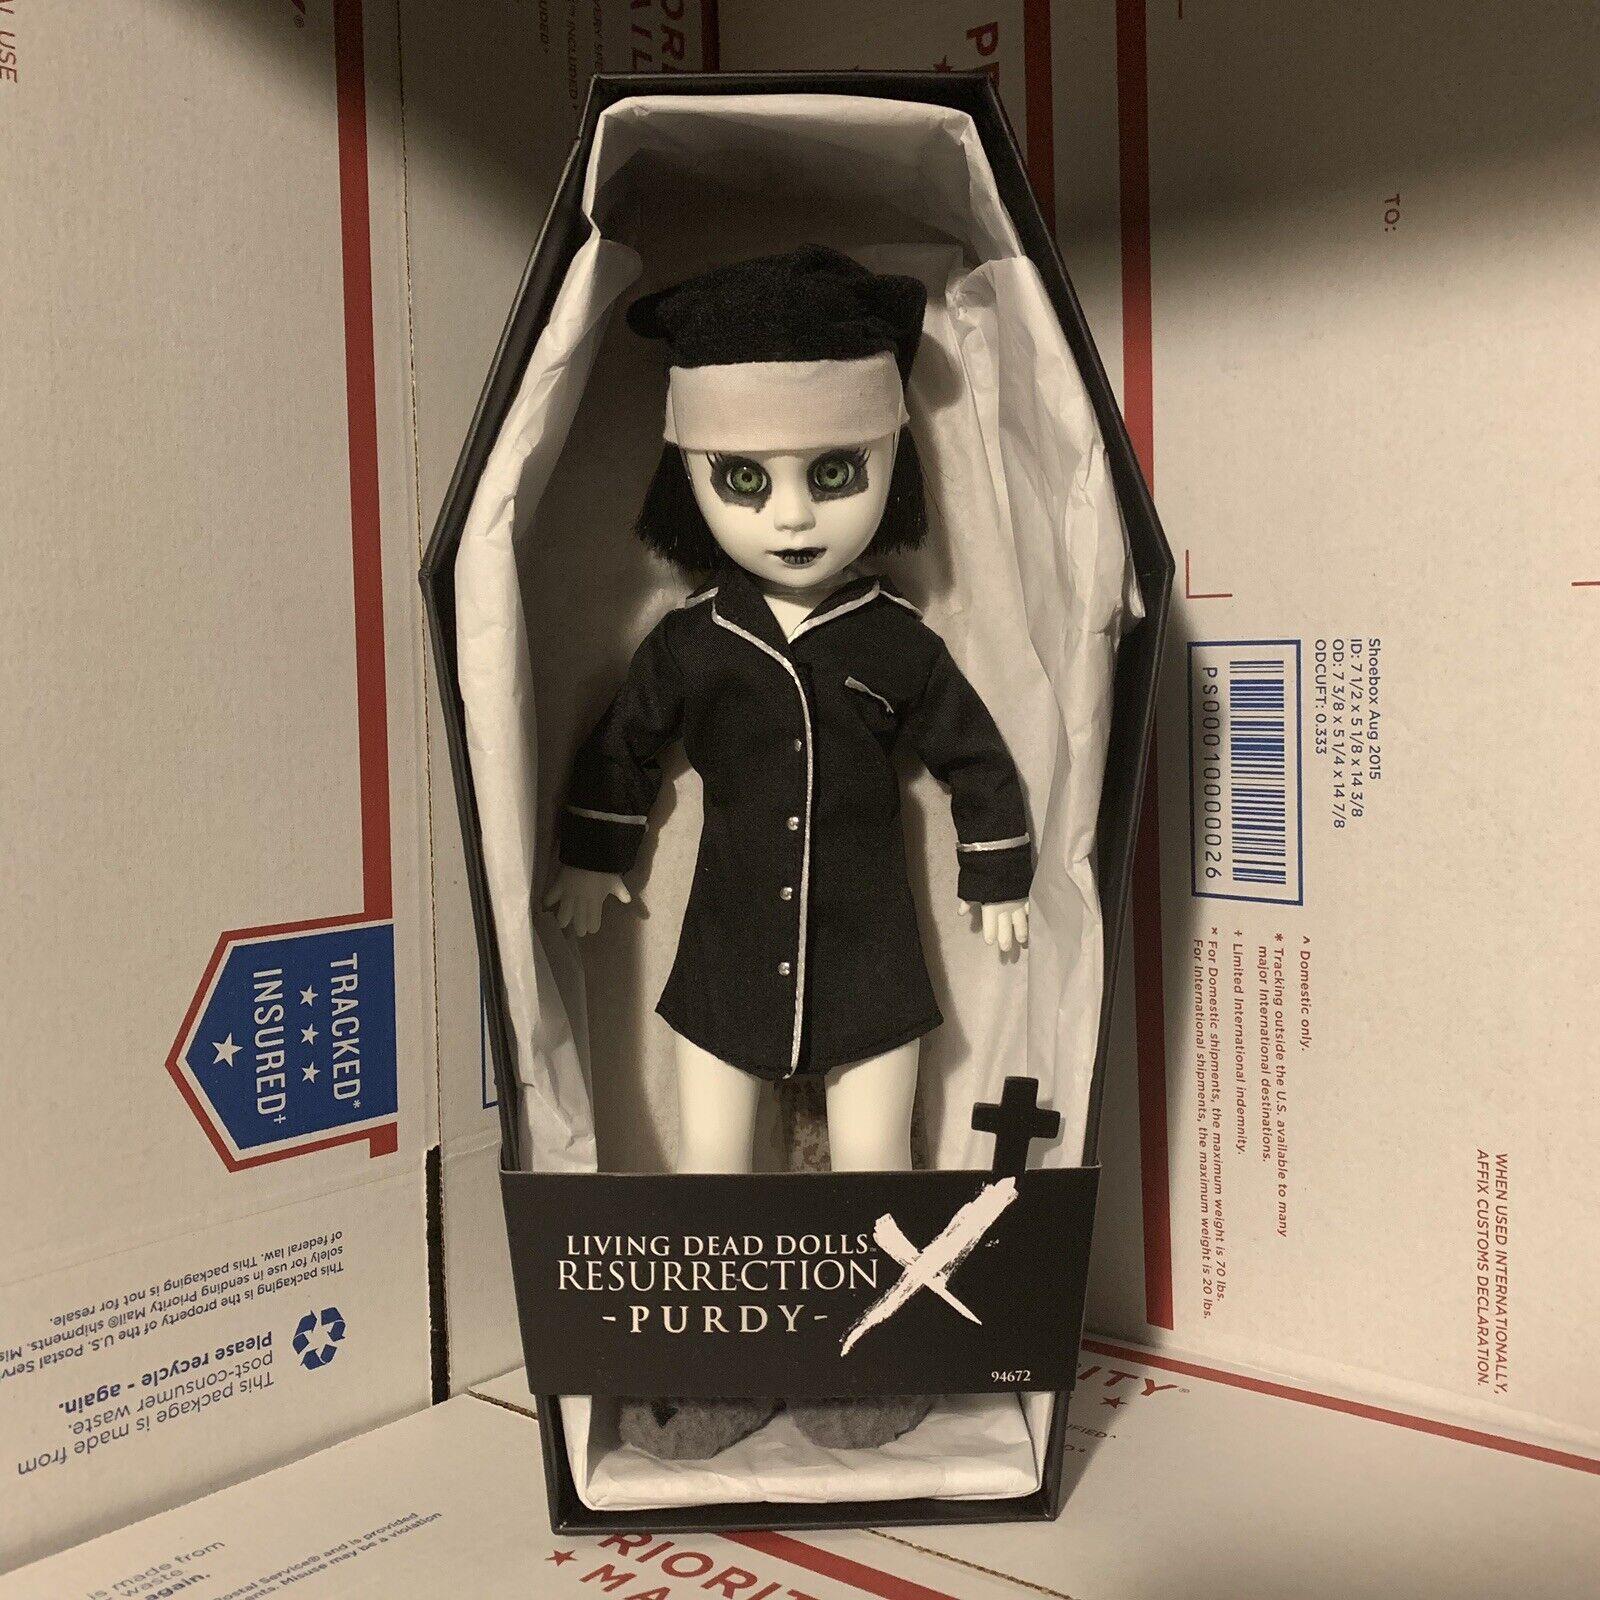 Living Dead Dolls resurrección X 10 Purdy Ldd Mezco Mezcotoyz Zombie